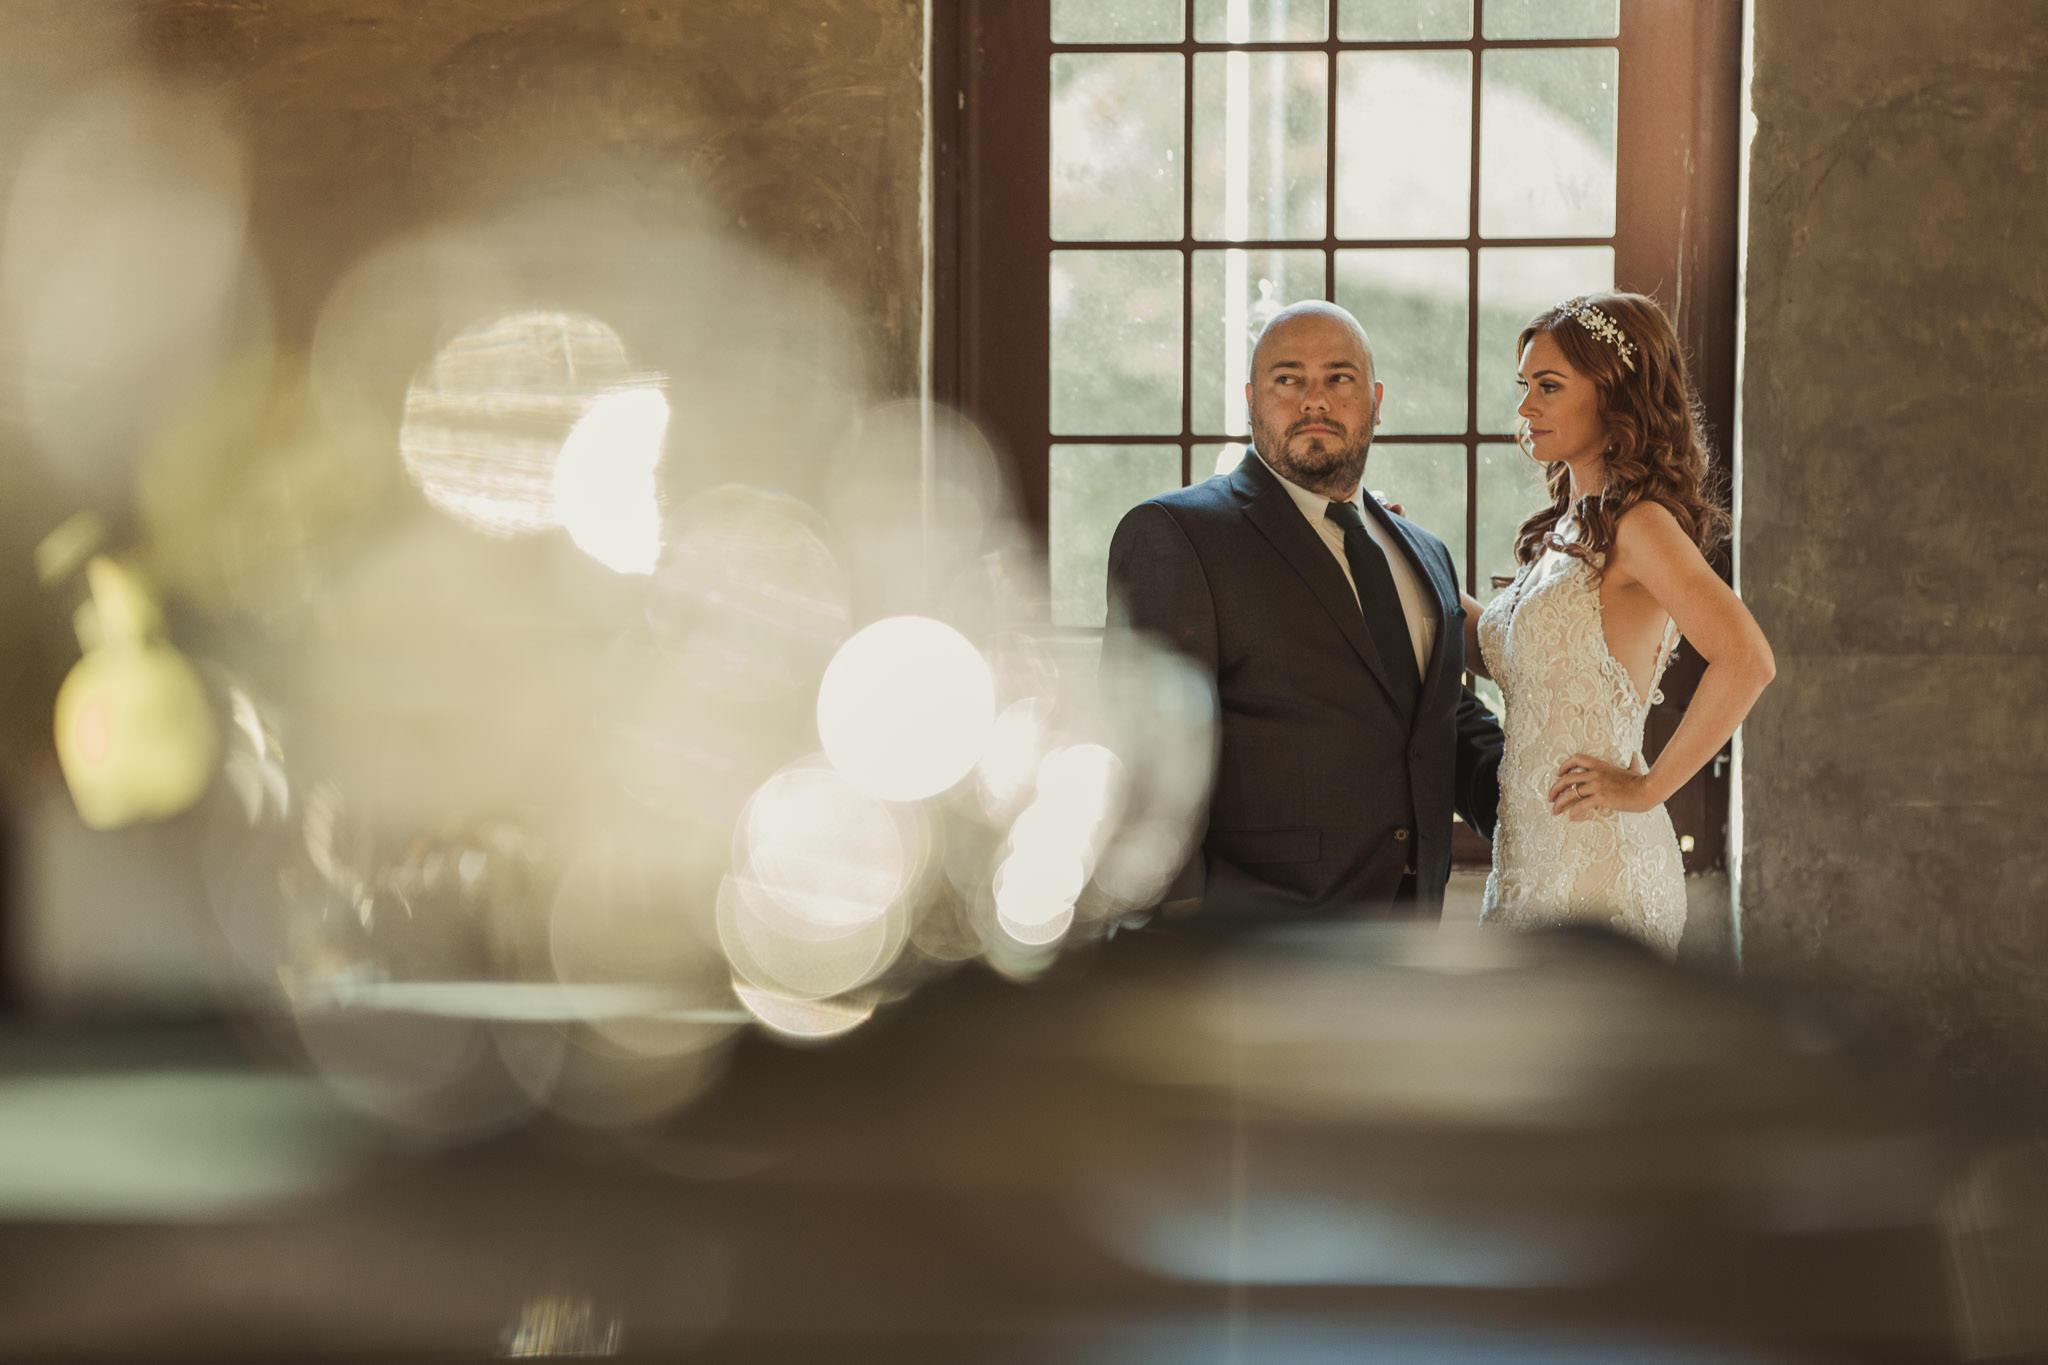 Cynthia-Curtis-Olde-Dobbine-Station-Houston-Wedding-Photographer-sm-51.jpg